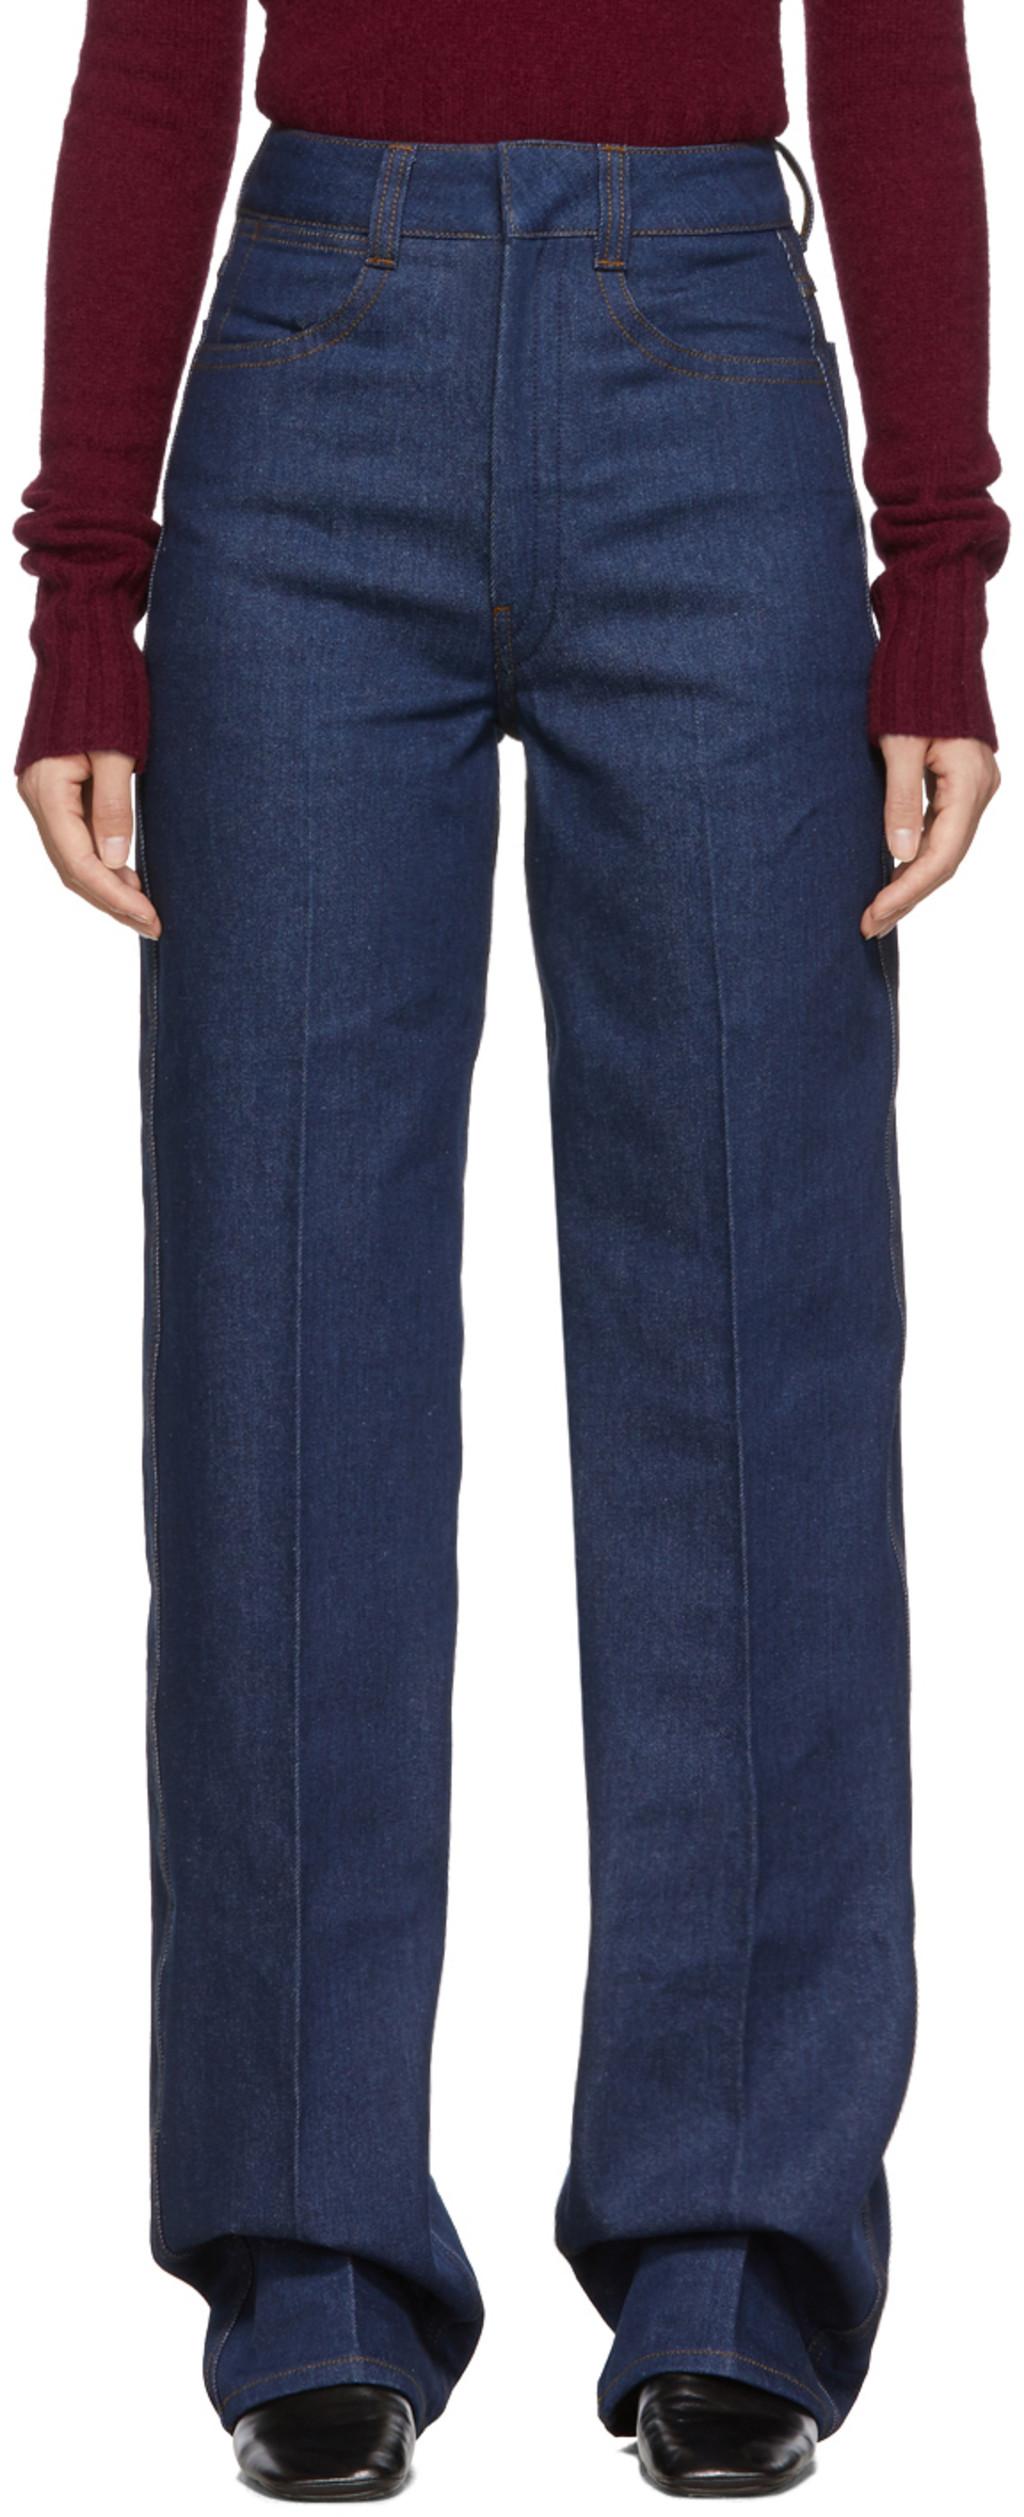 436bbf834 Indigo Denim Jeans